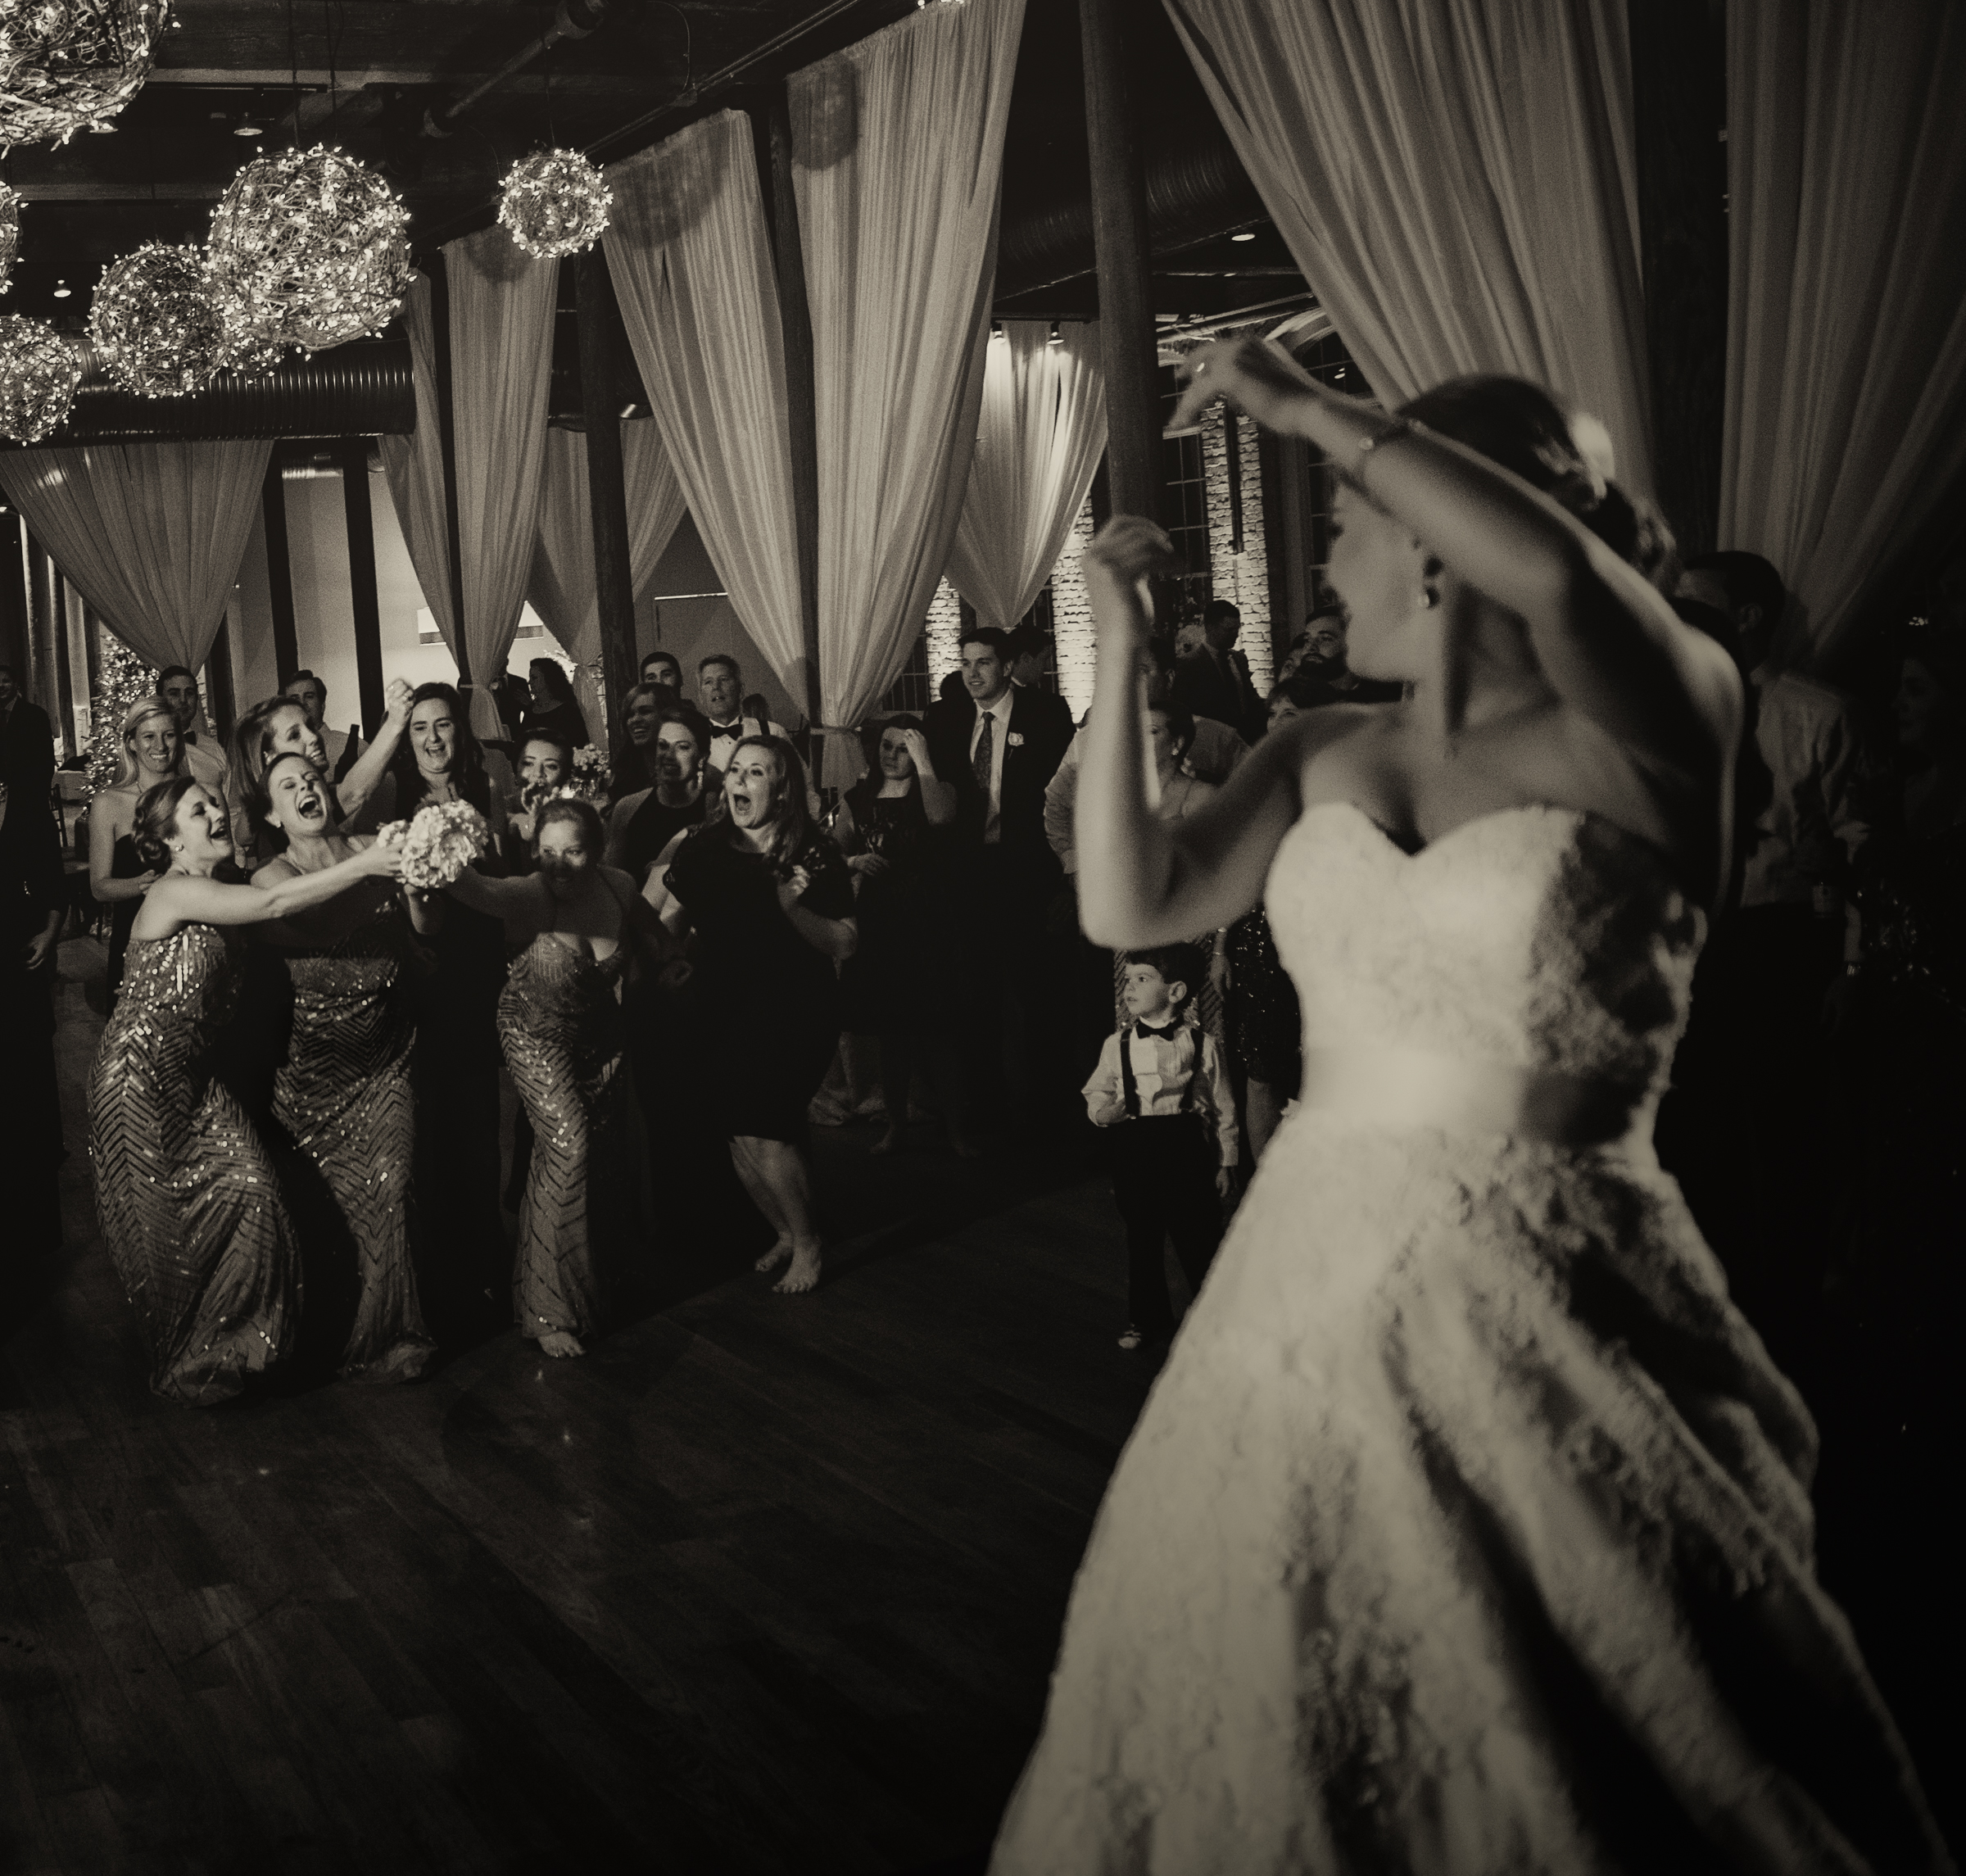 Irvin Wedding 1.2.16-3689-Edit.jpg